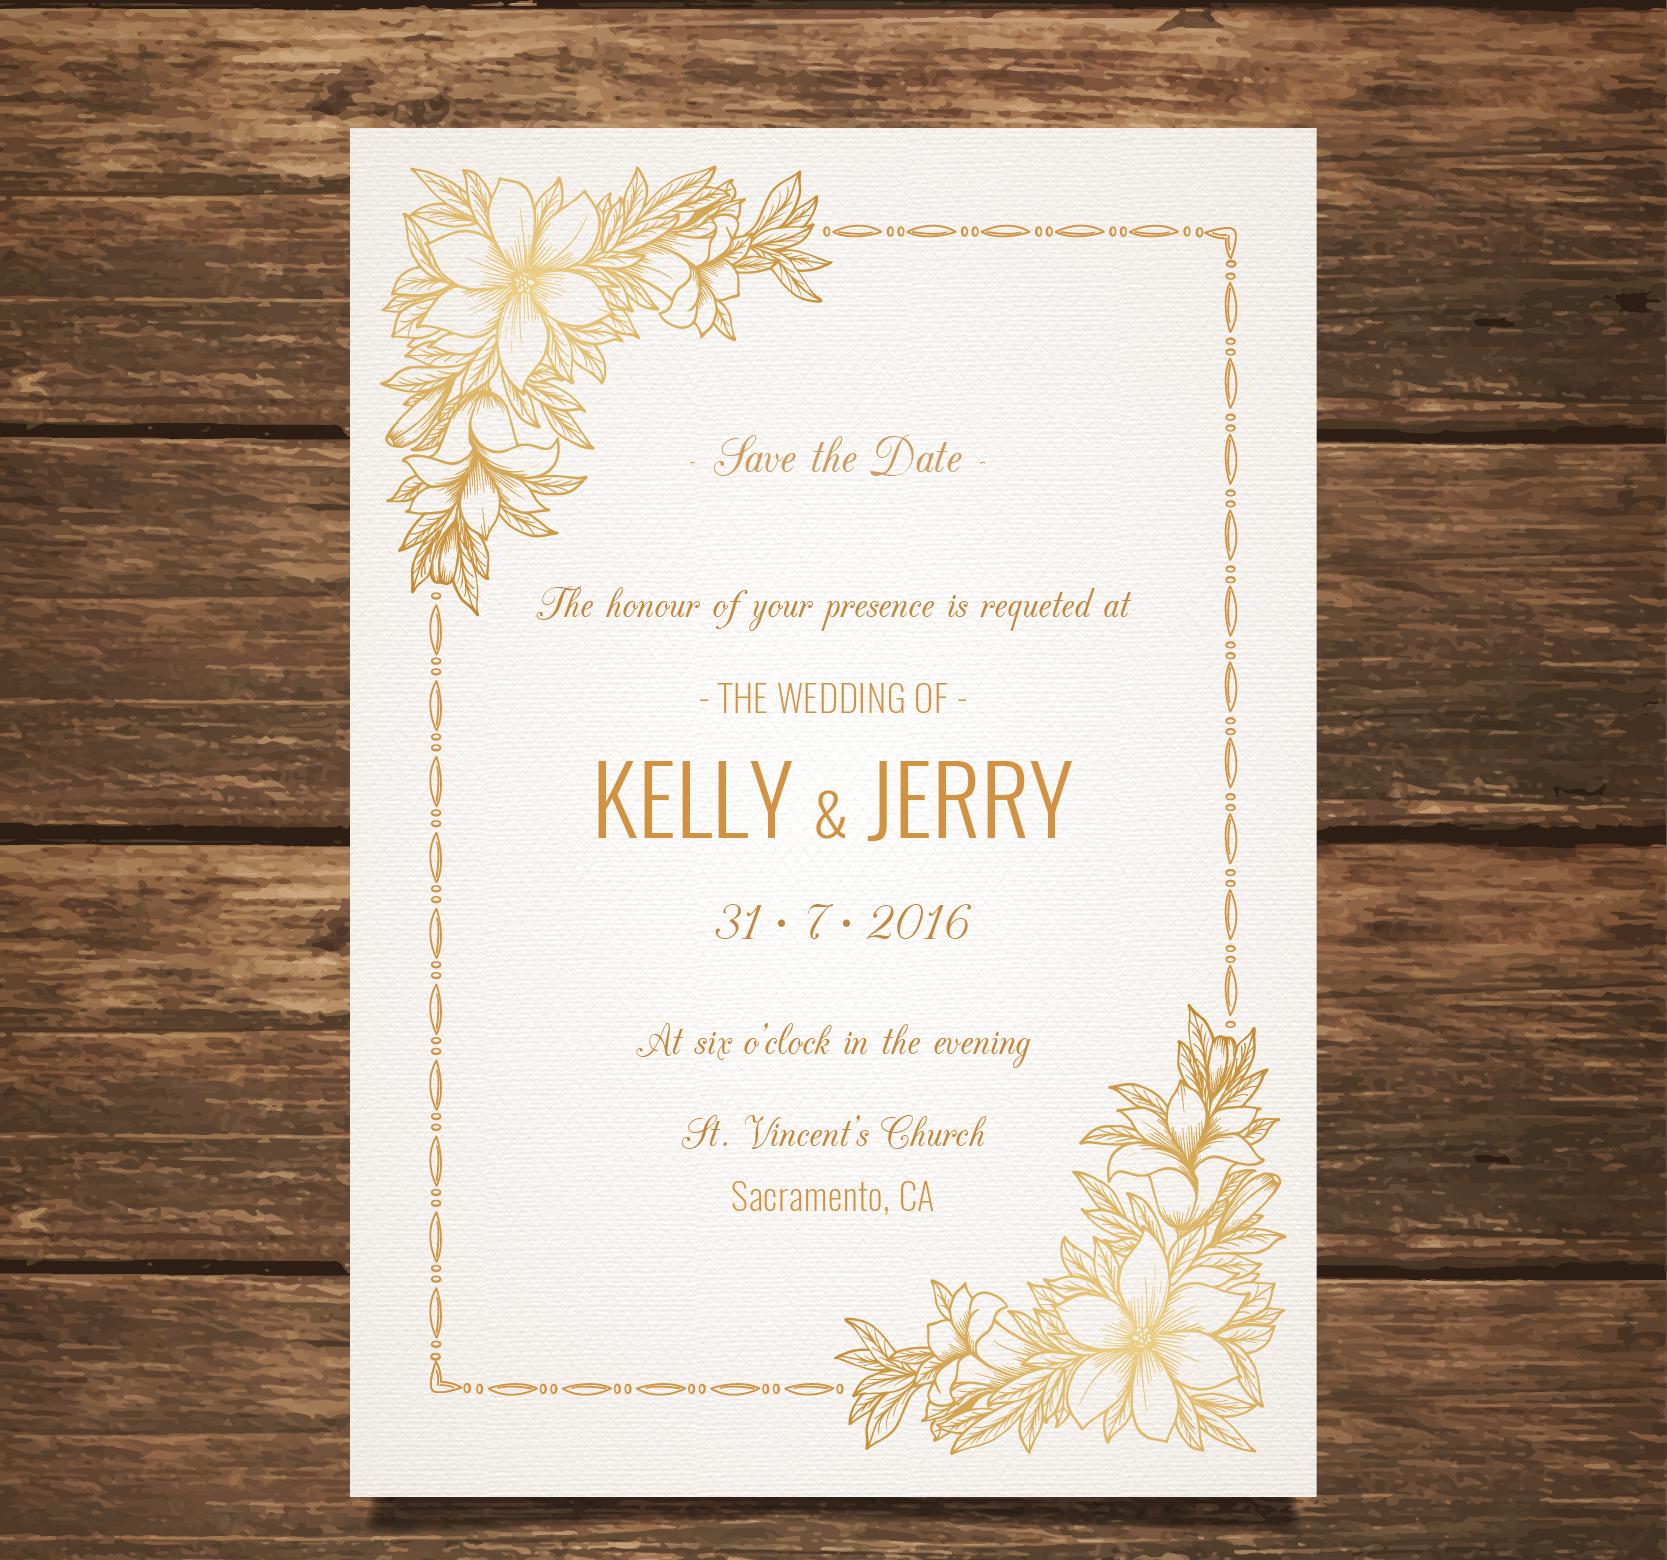 wedding invitation with golden flowers